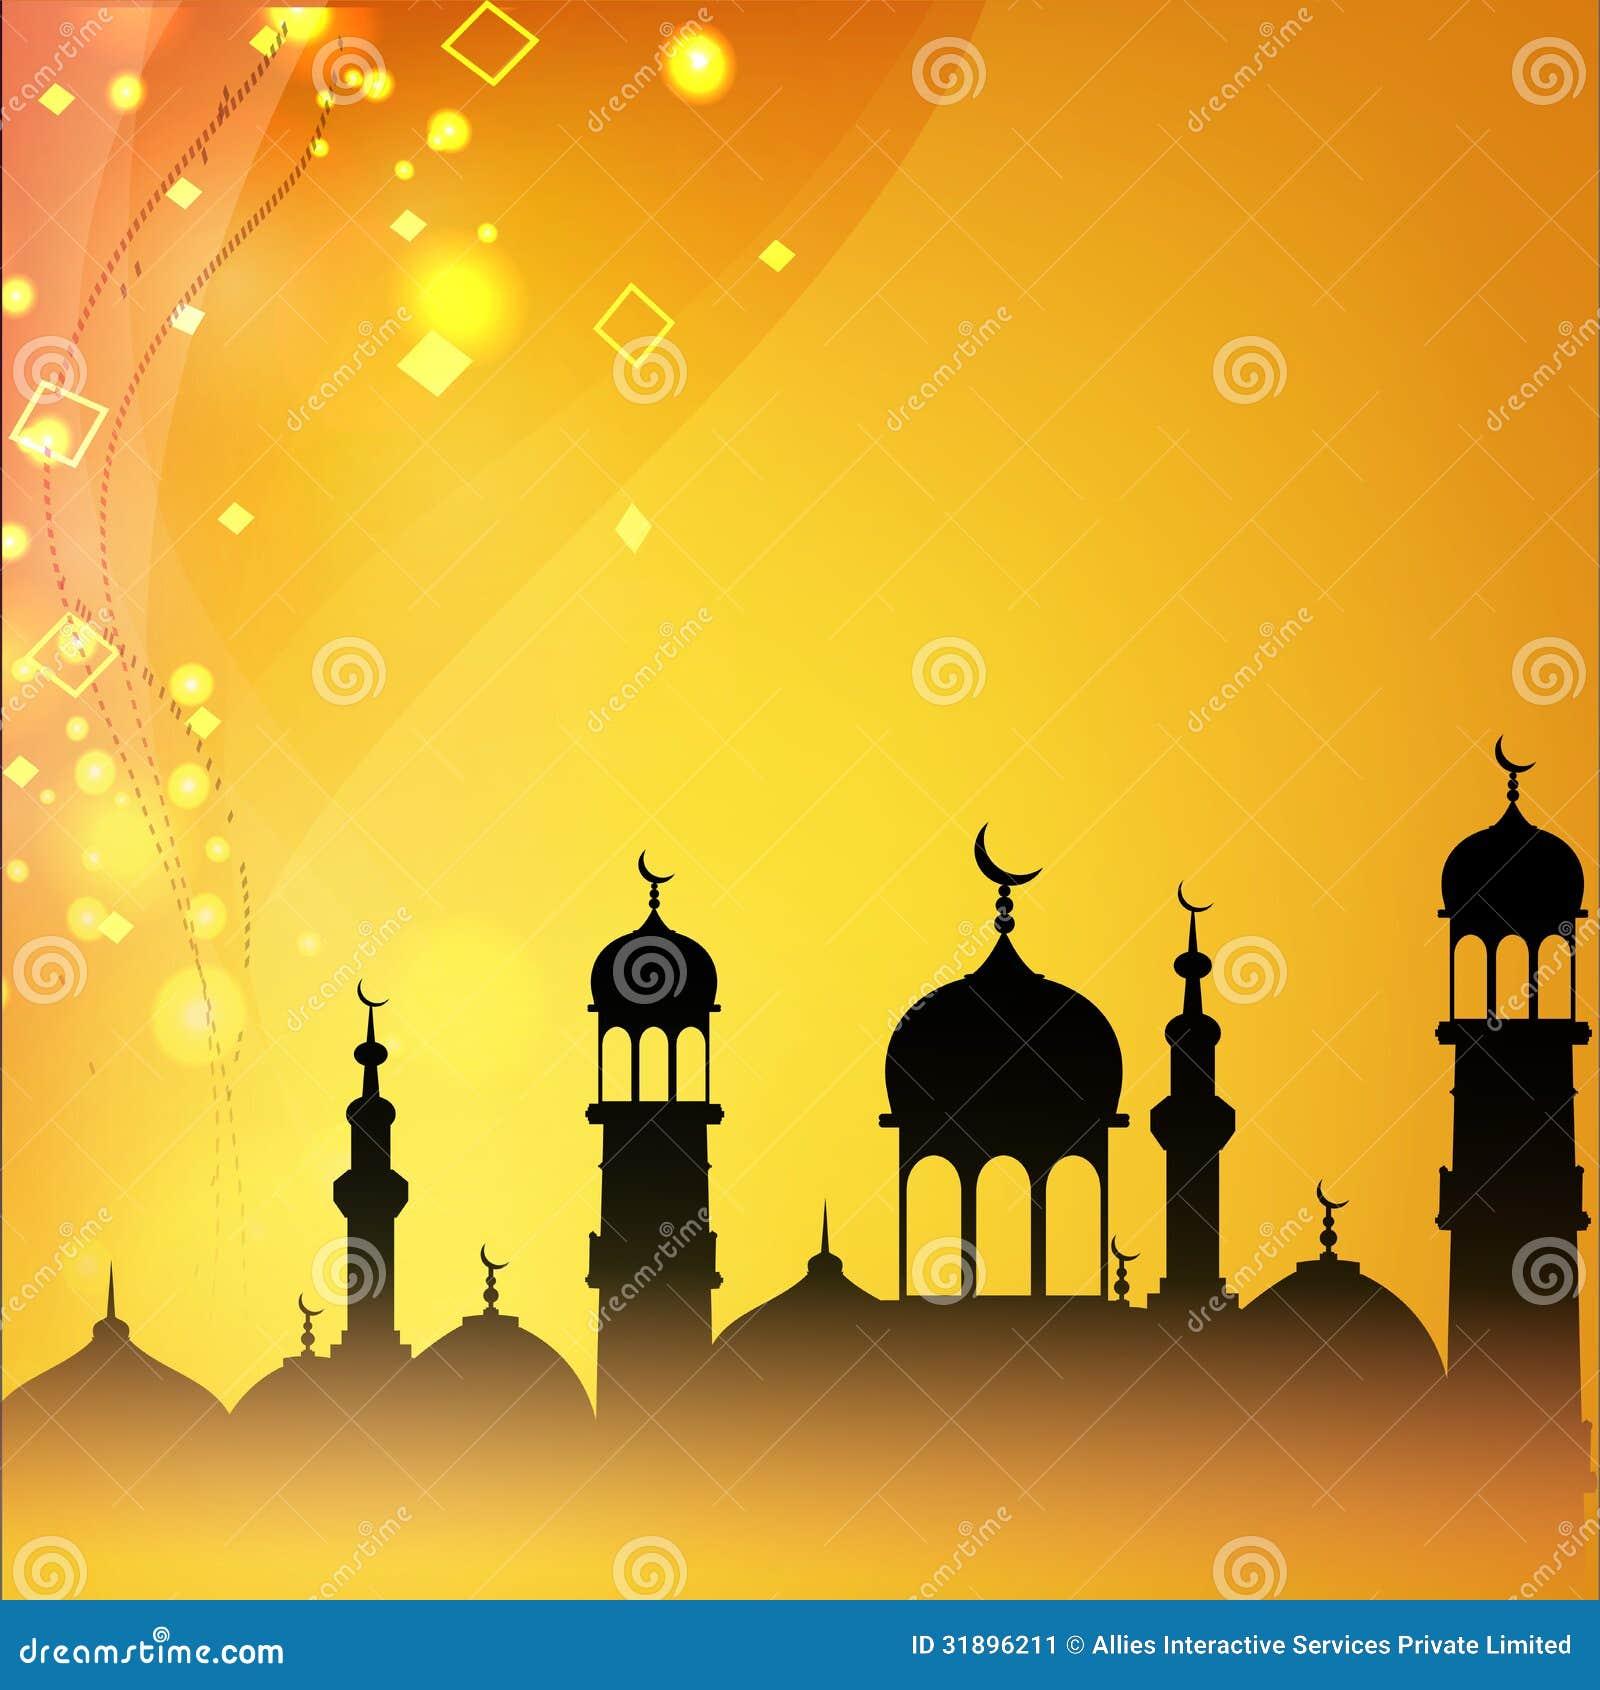 Mosque background for ramadan kareem stock photography image - Ramadan Kareem Background Stock Image